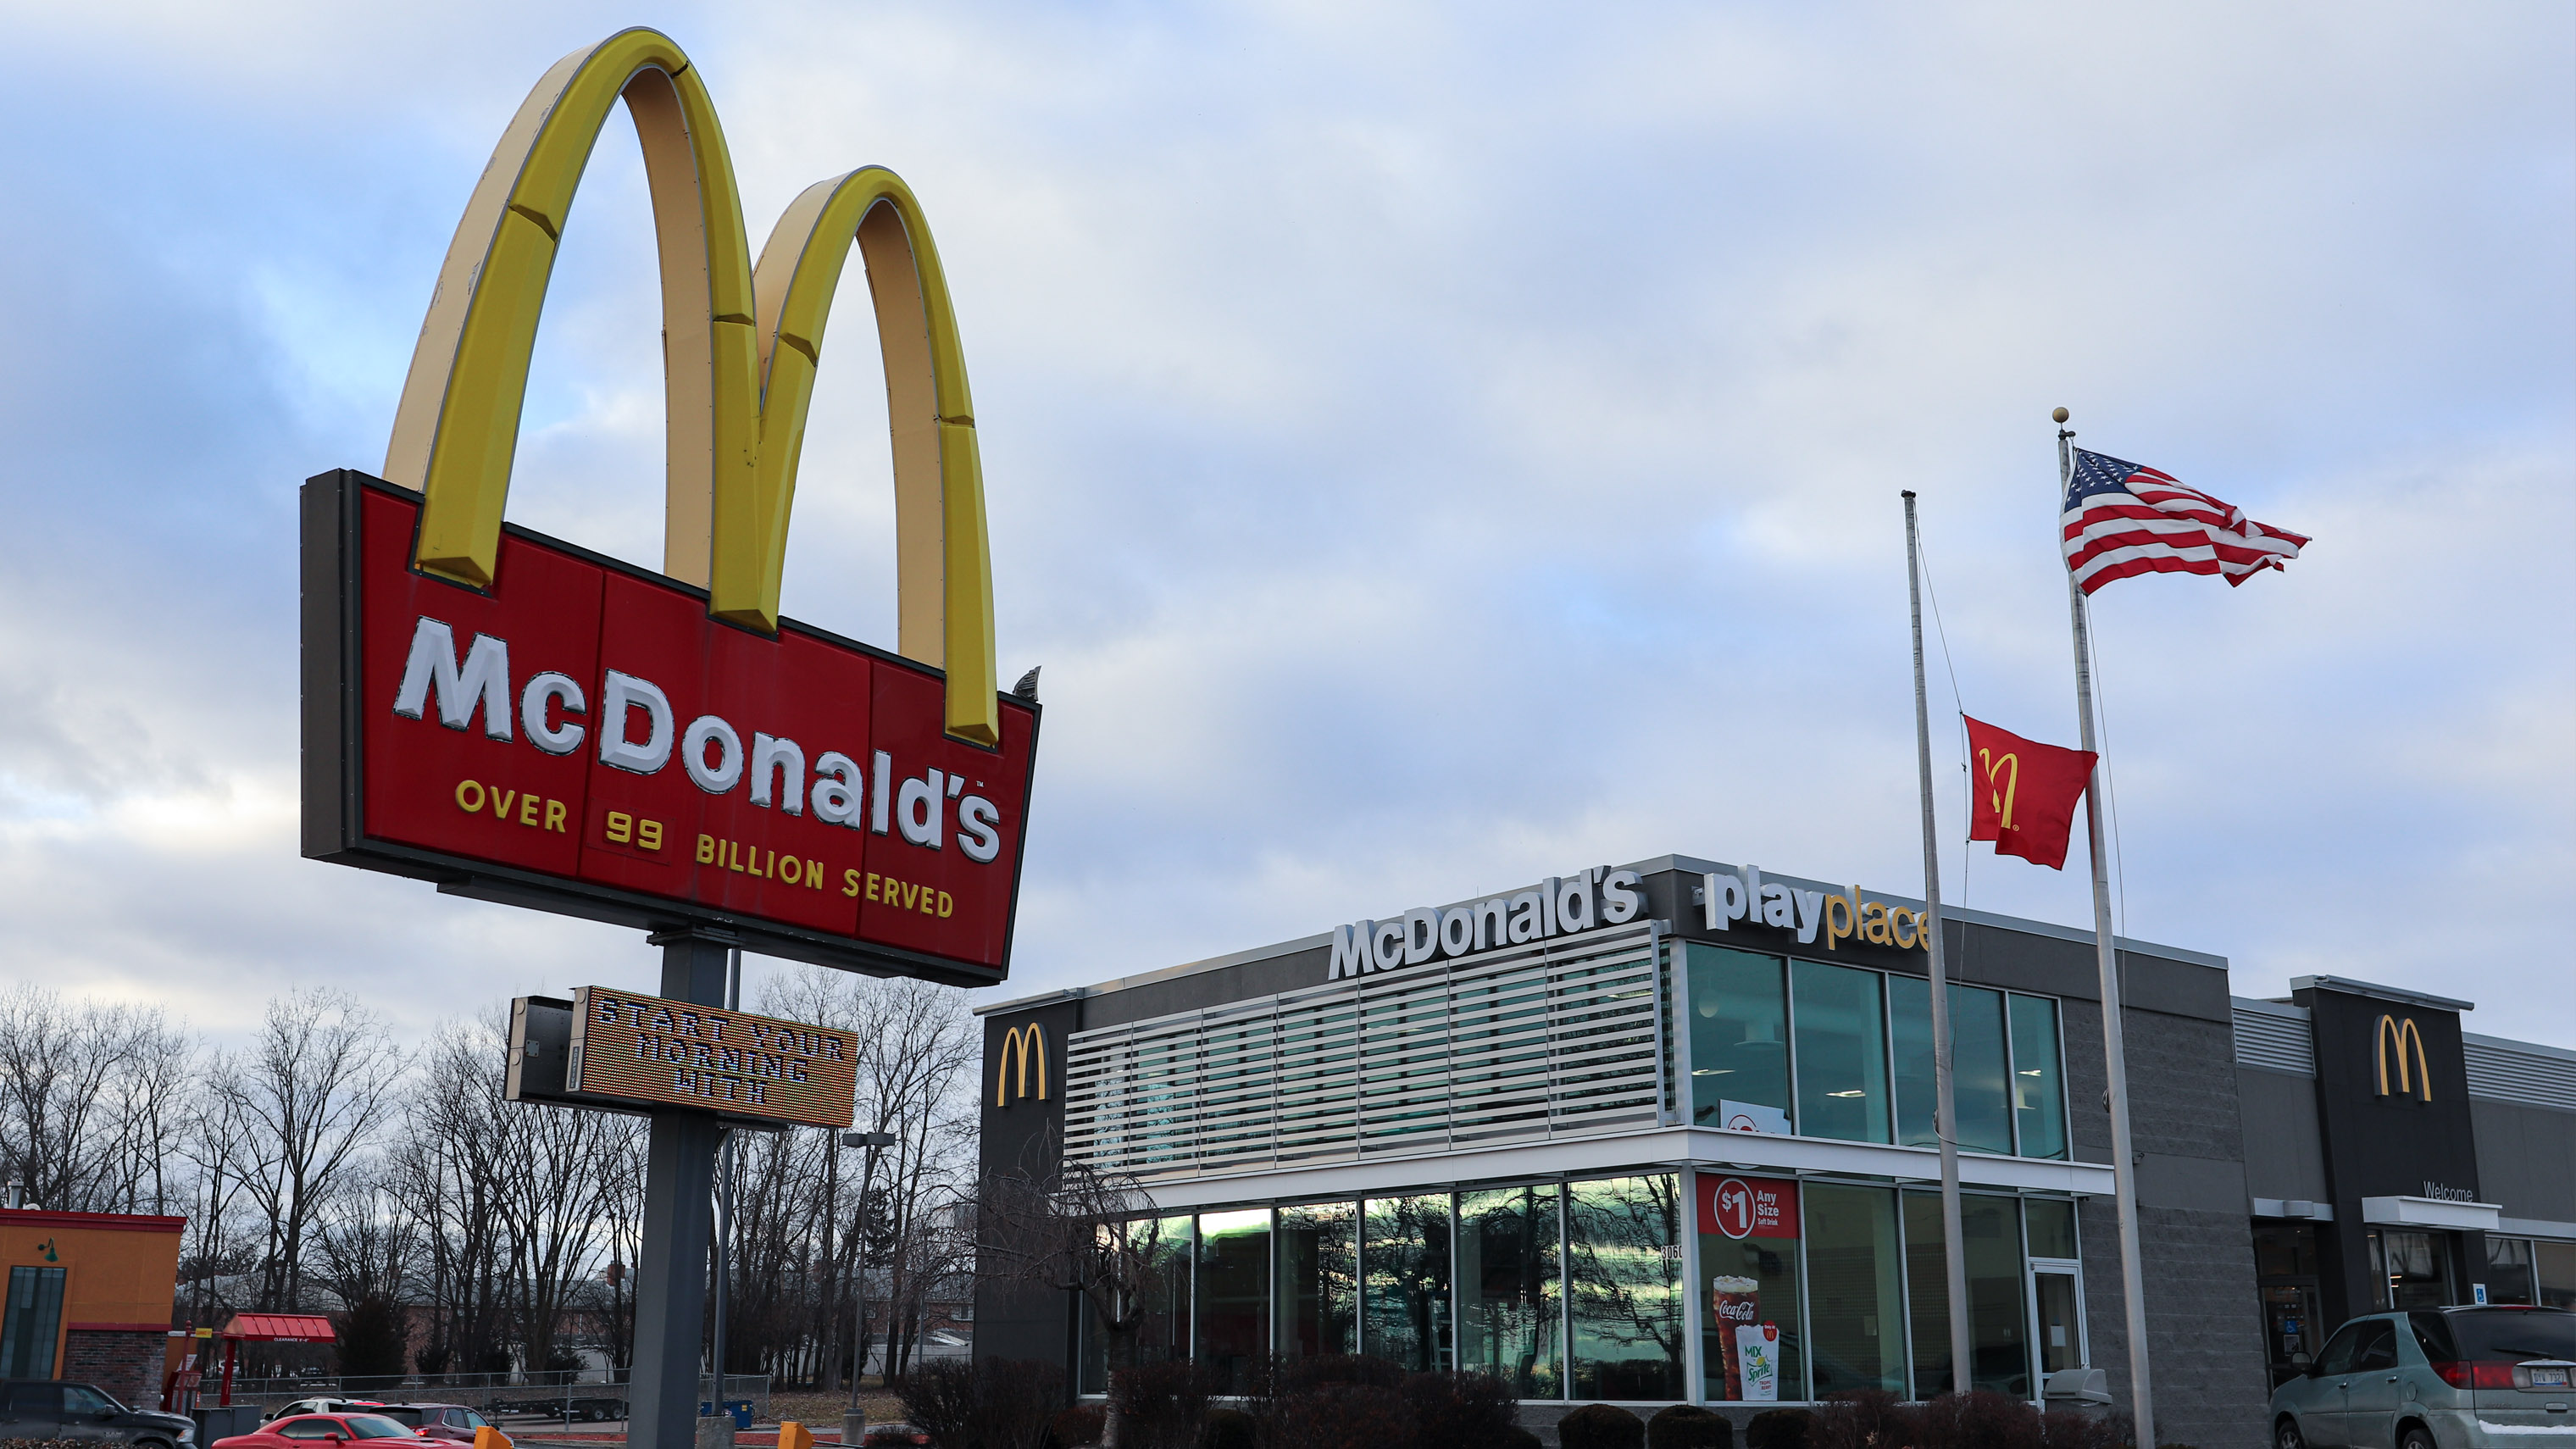 Miller Road Flint McDonald's storefront